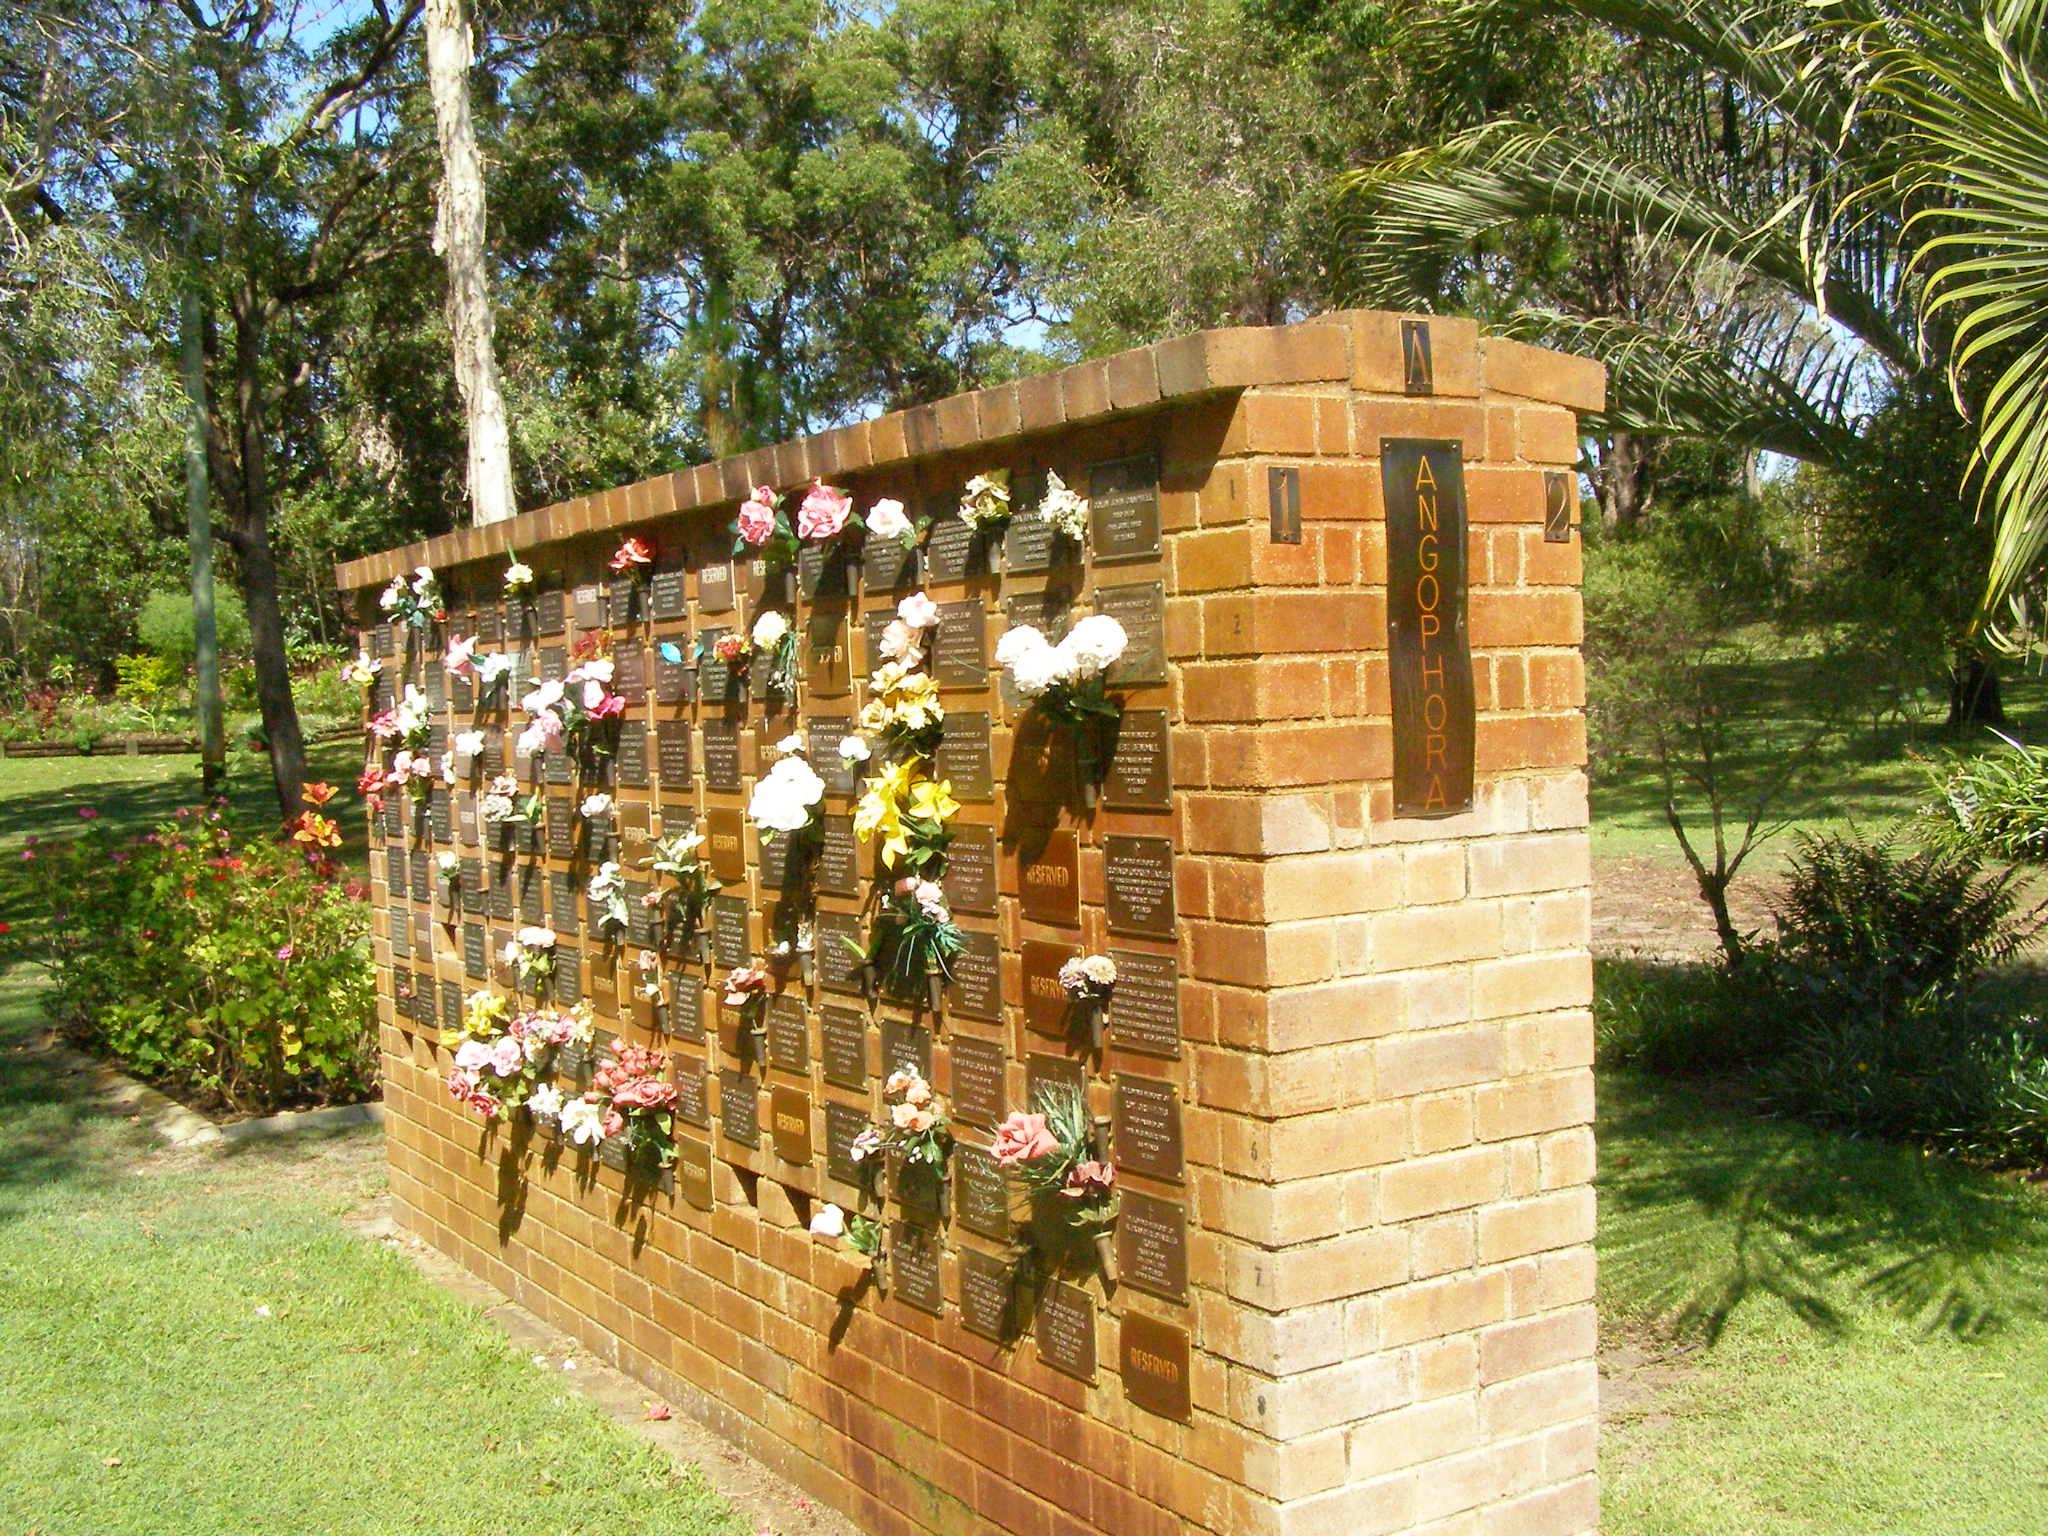 Bribie Island Memorial Gardens Memorial Inscriptions